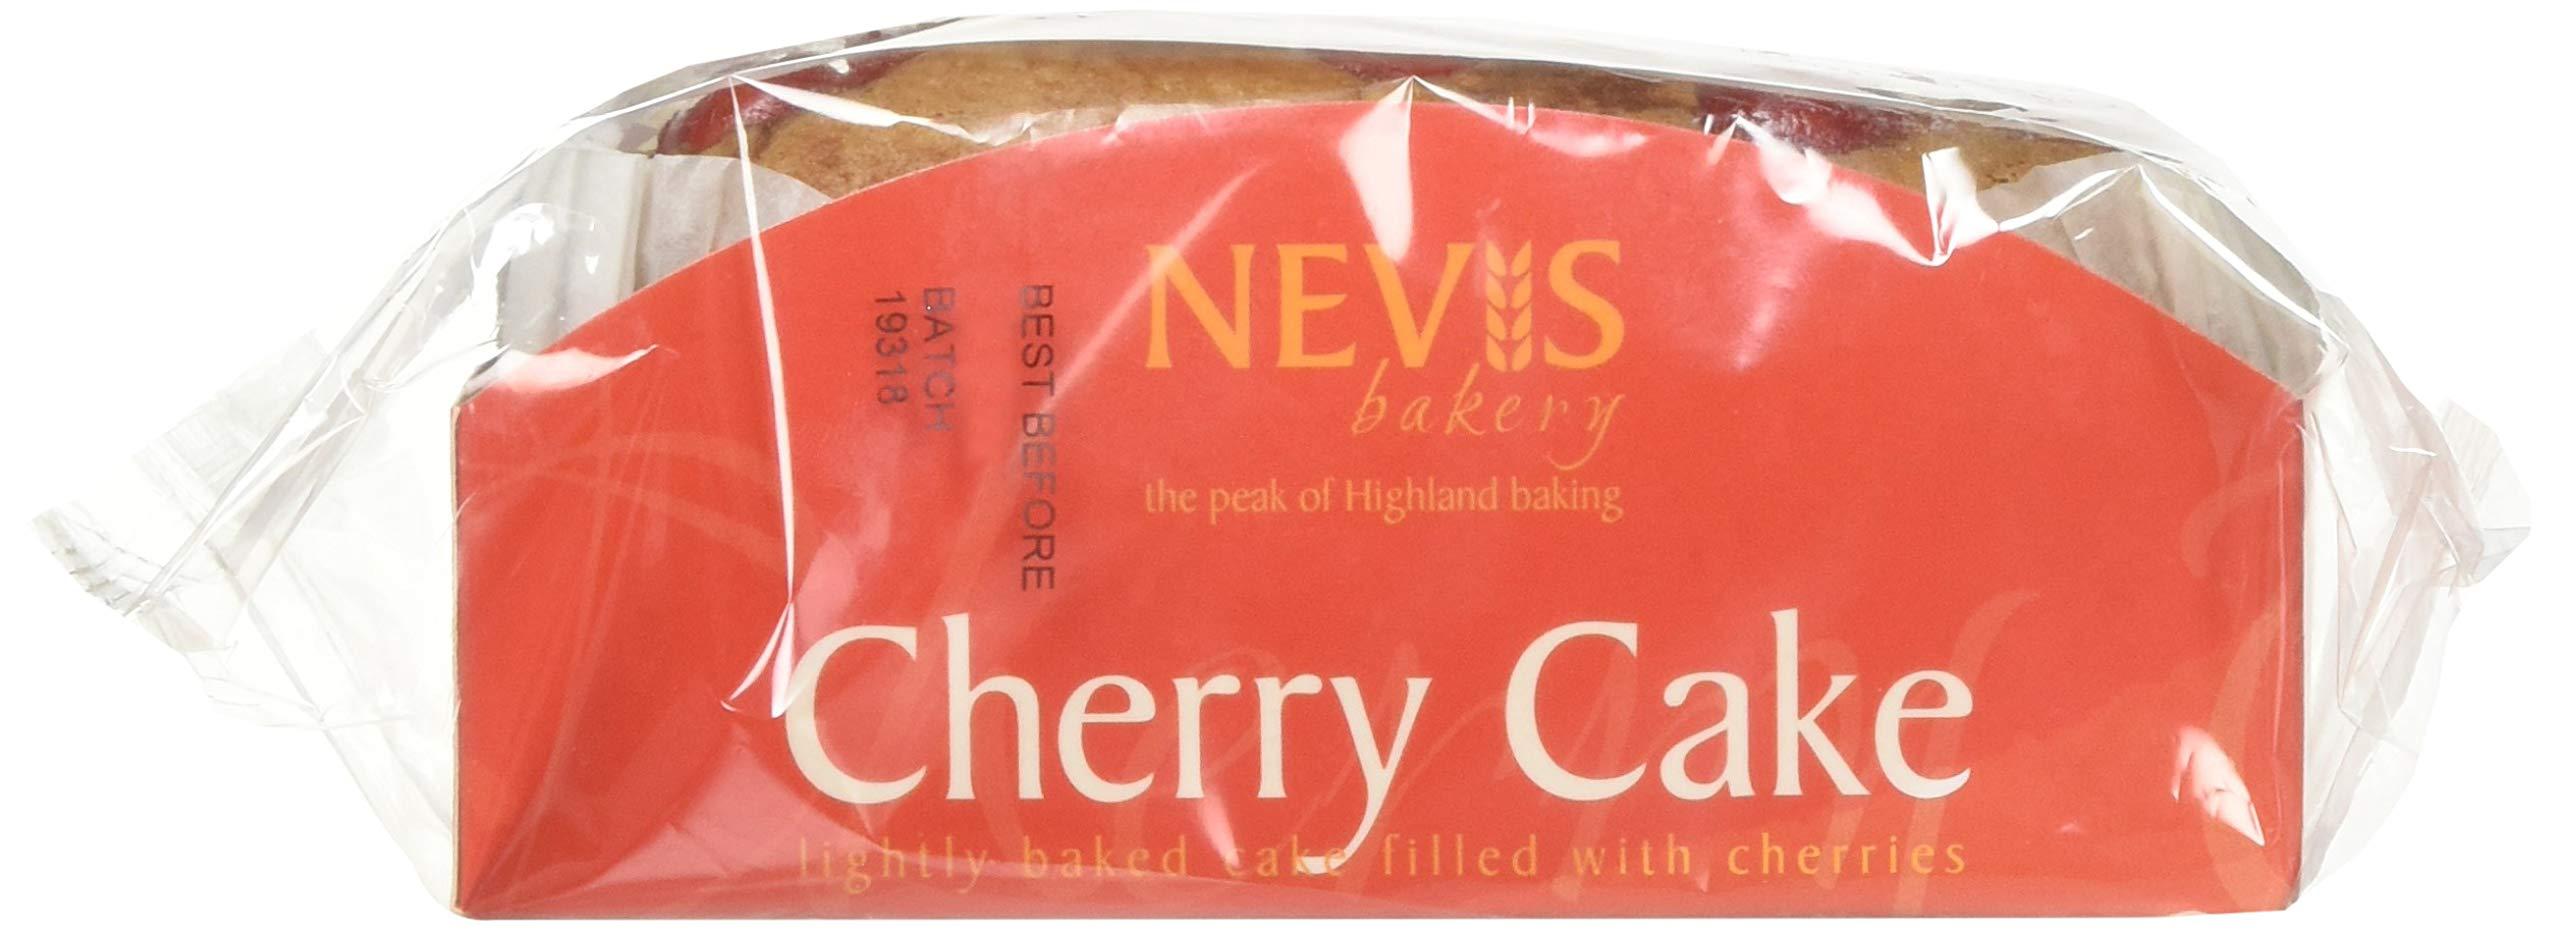 Nevis Bakery - Cherry Cake 360g